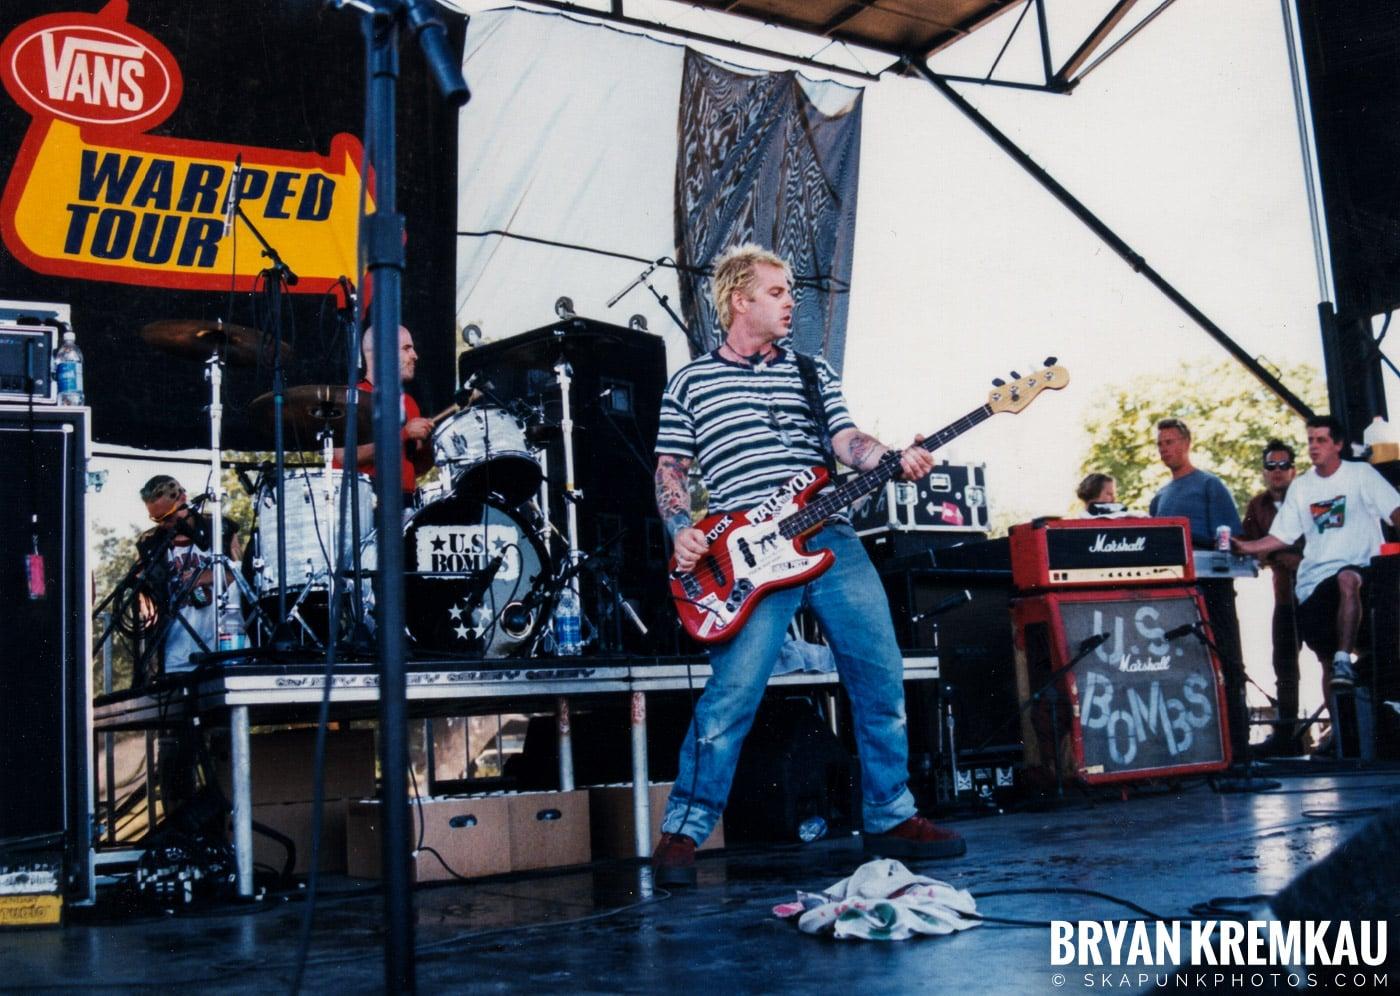 U.S. Bombs @ Vans Warped Tour, Randall's Island, NYC - 8.1.98 (4)